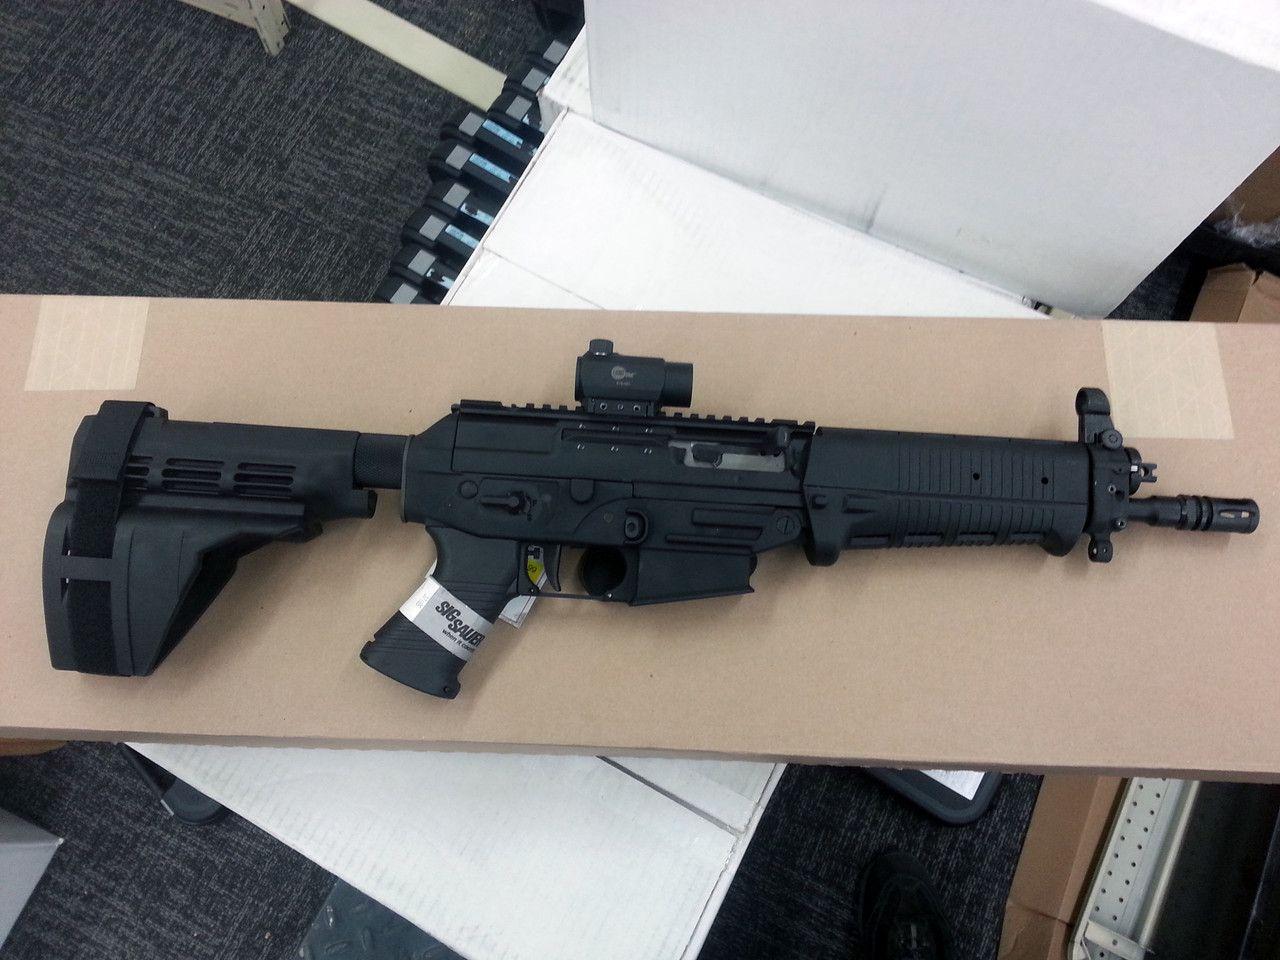 Sig 556 pistol with SB15 pistol stabilizing brace | Guns ...